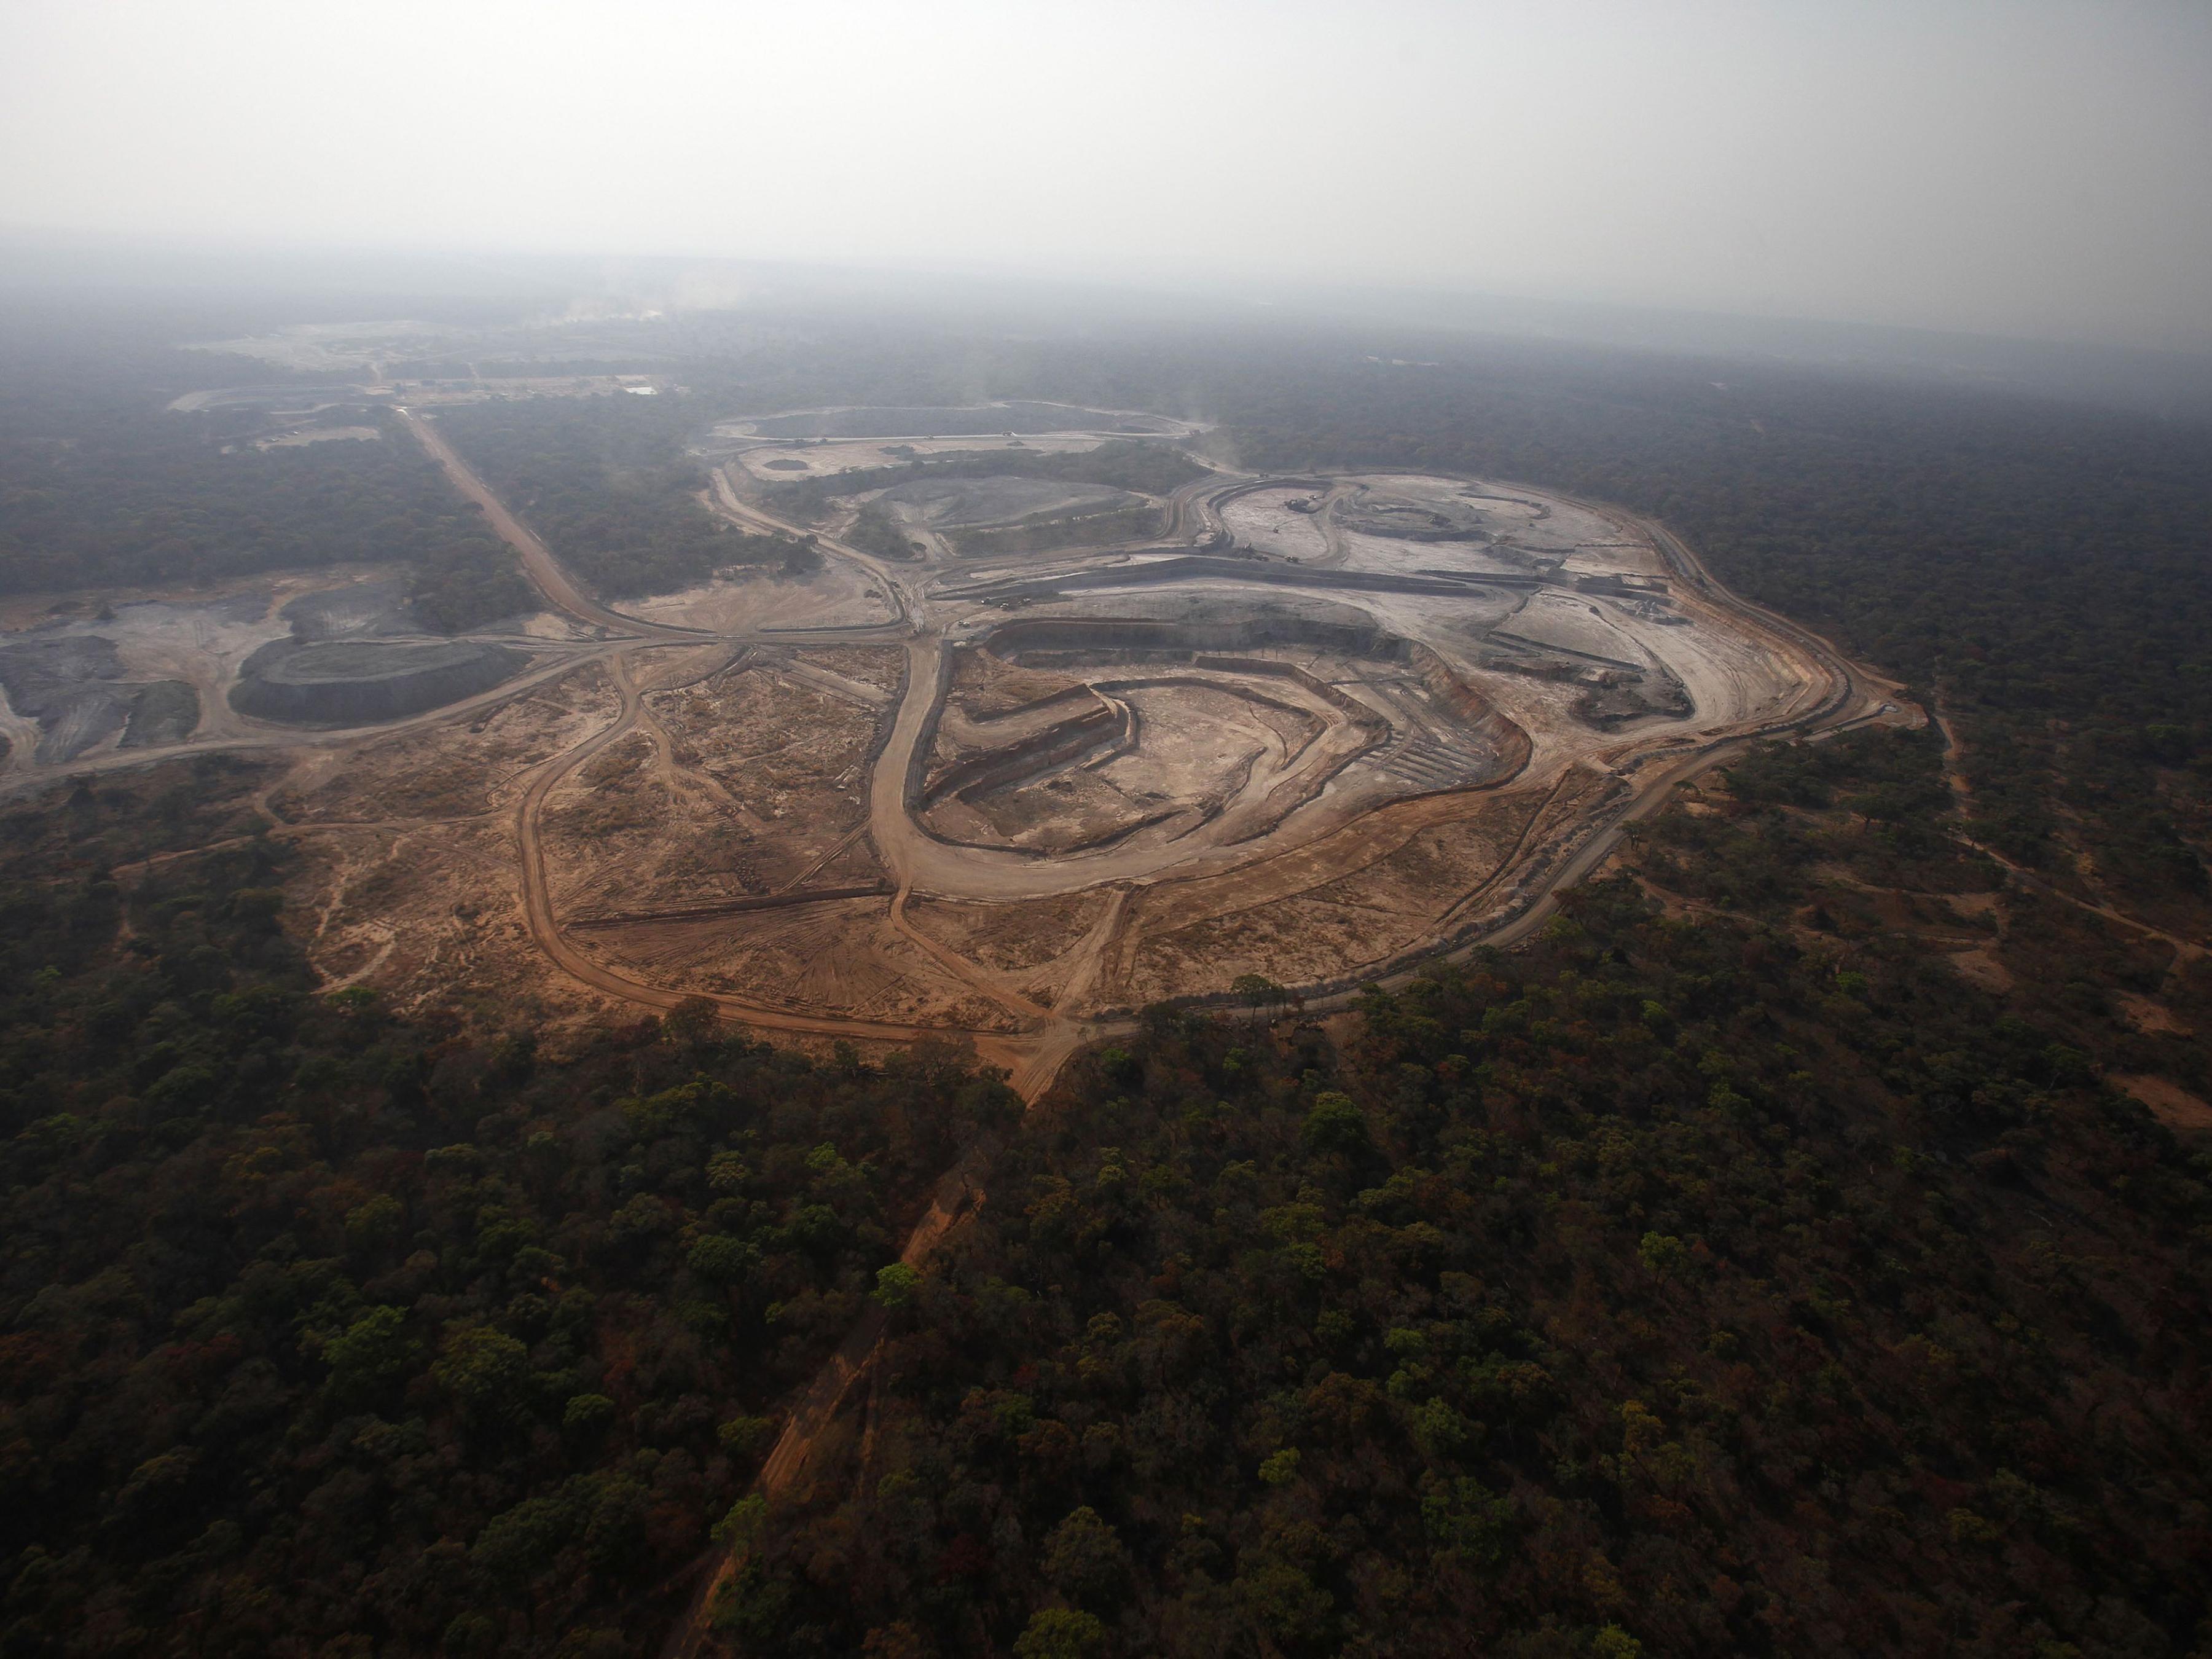 Cobalt mining